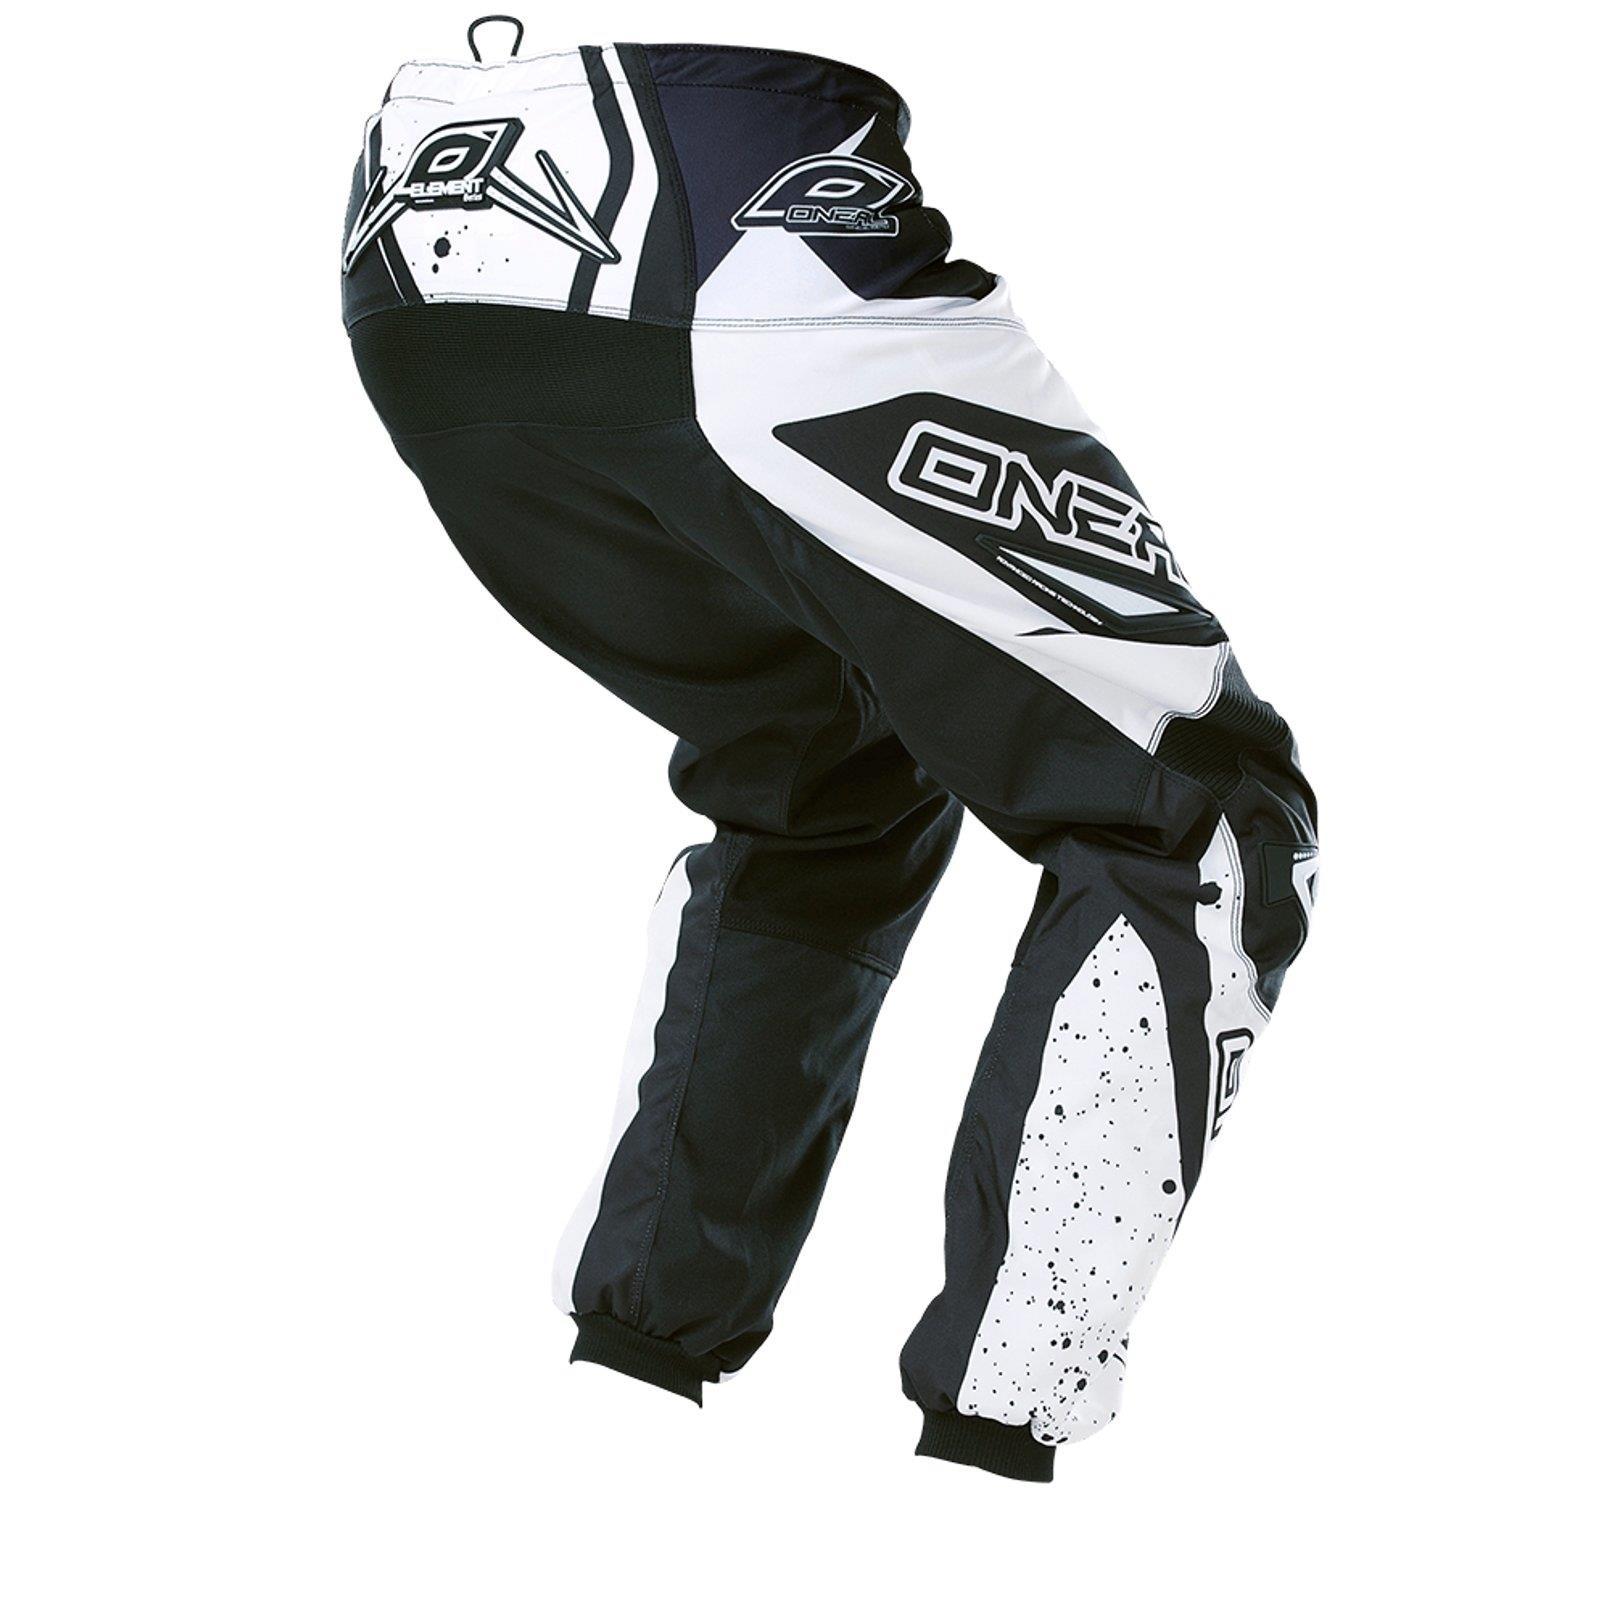 O-039-Neal-Element-MX-Pantaloni-Racewear-Pant-moto-cross-SX-Enduro-Fuoristrada-Moto-Quad miniatura 9